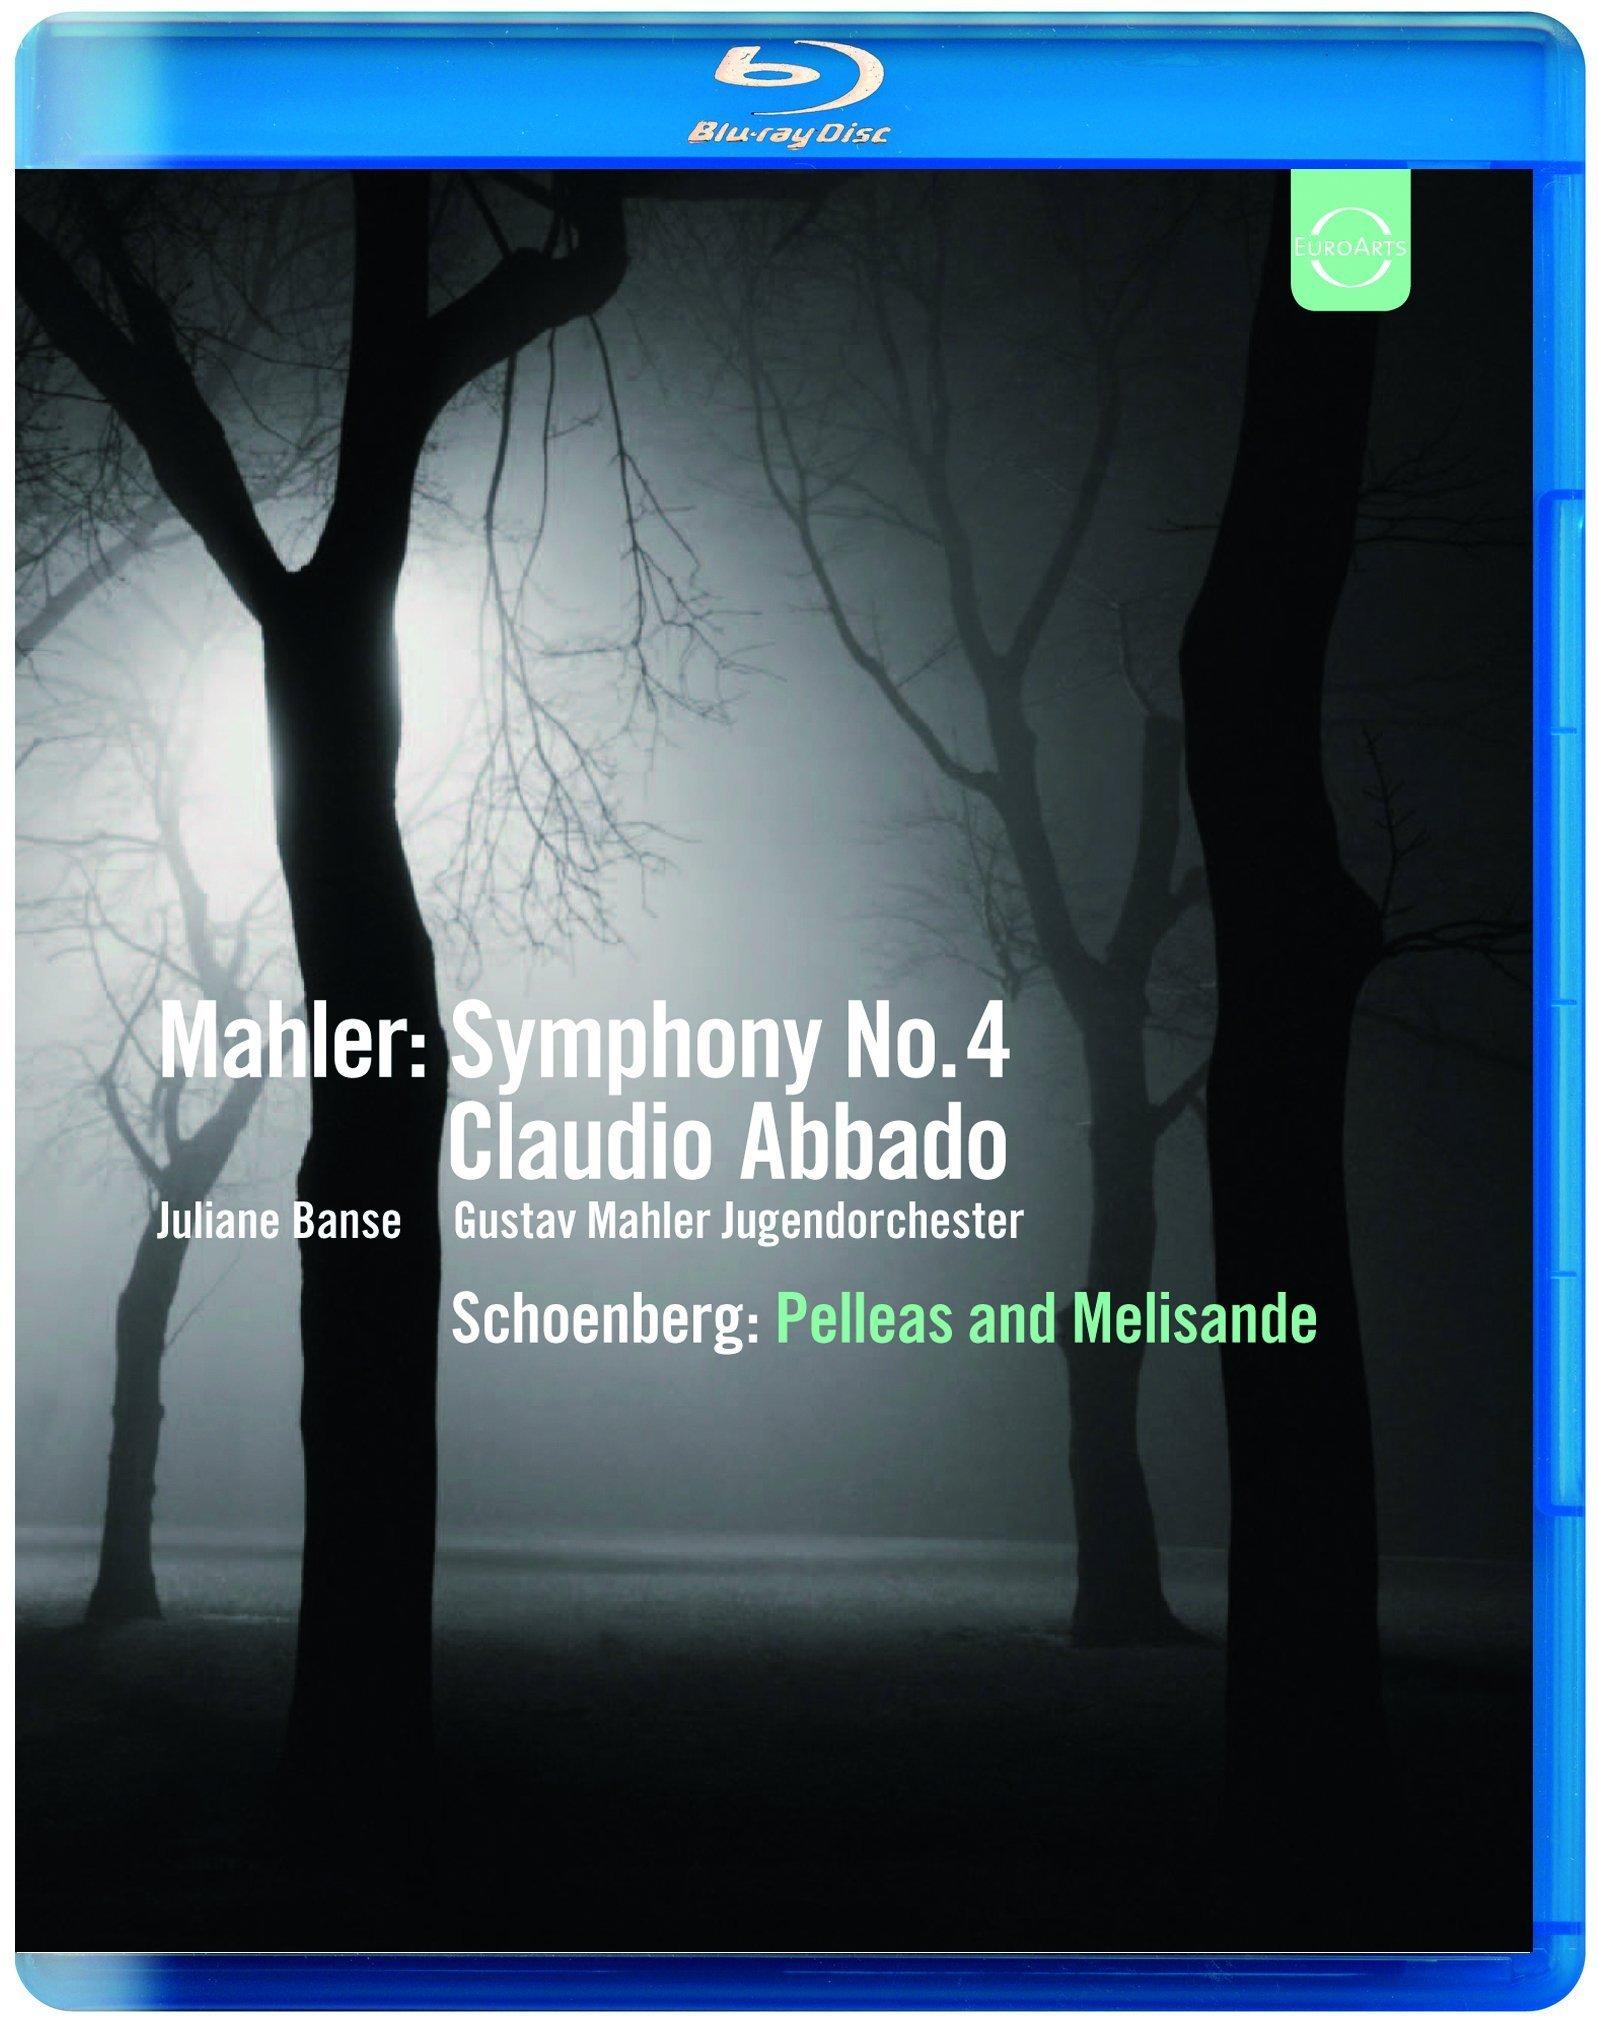 Blu-ray : Claudio Abbado - Symphony No. 4 /  Pelleas & Melisande (Blu-ray)